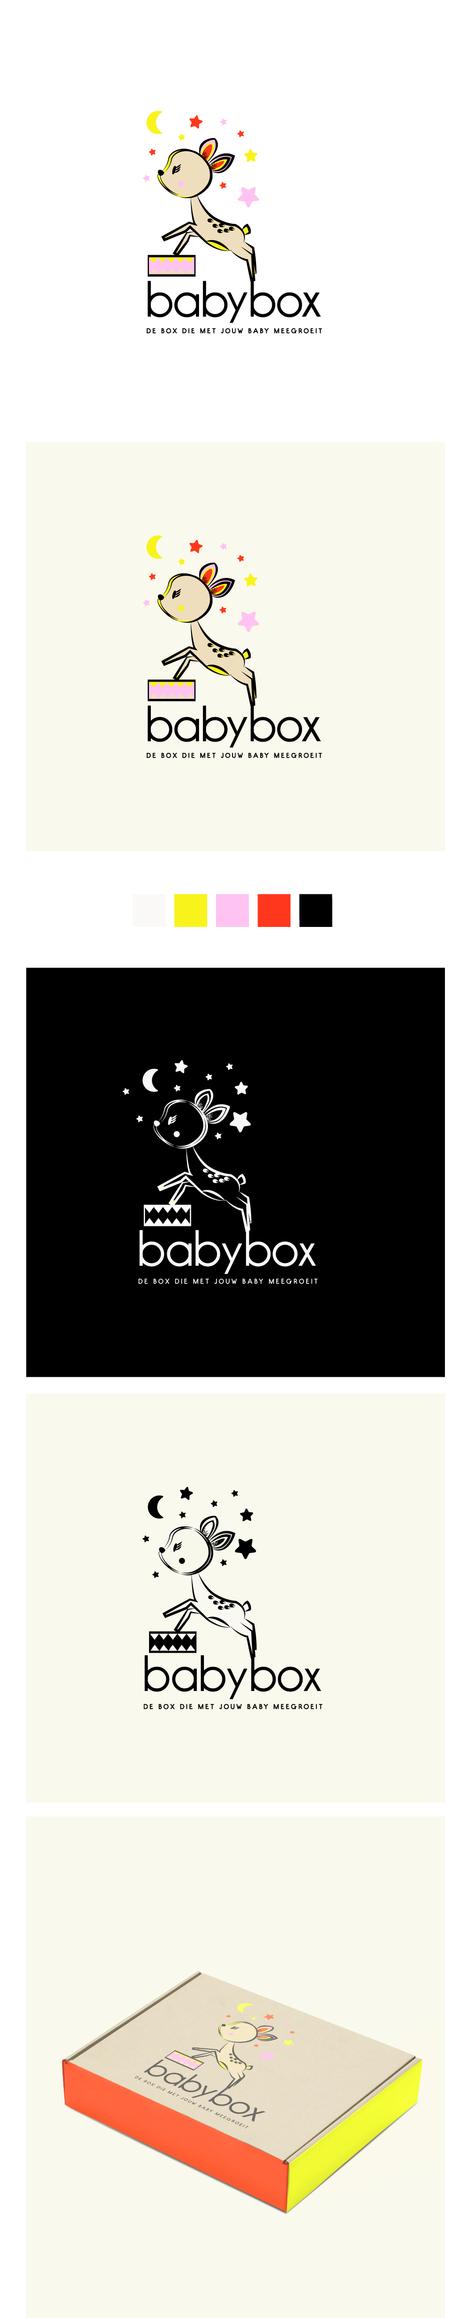 babybox logo design